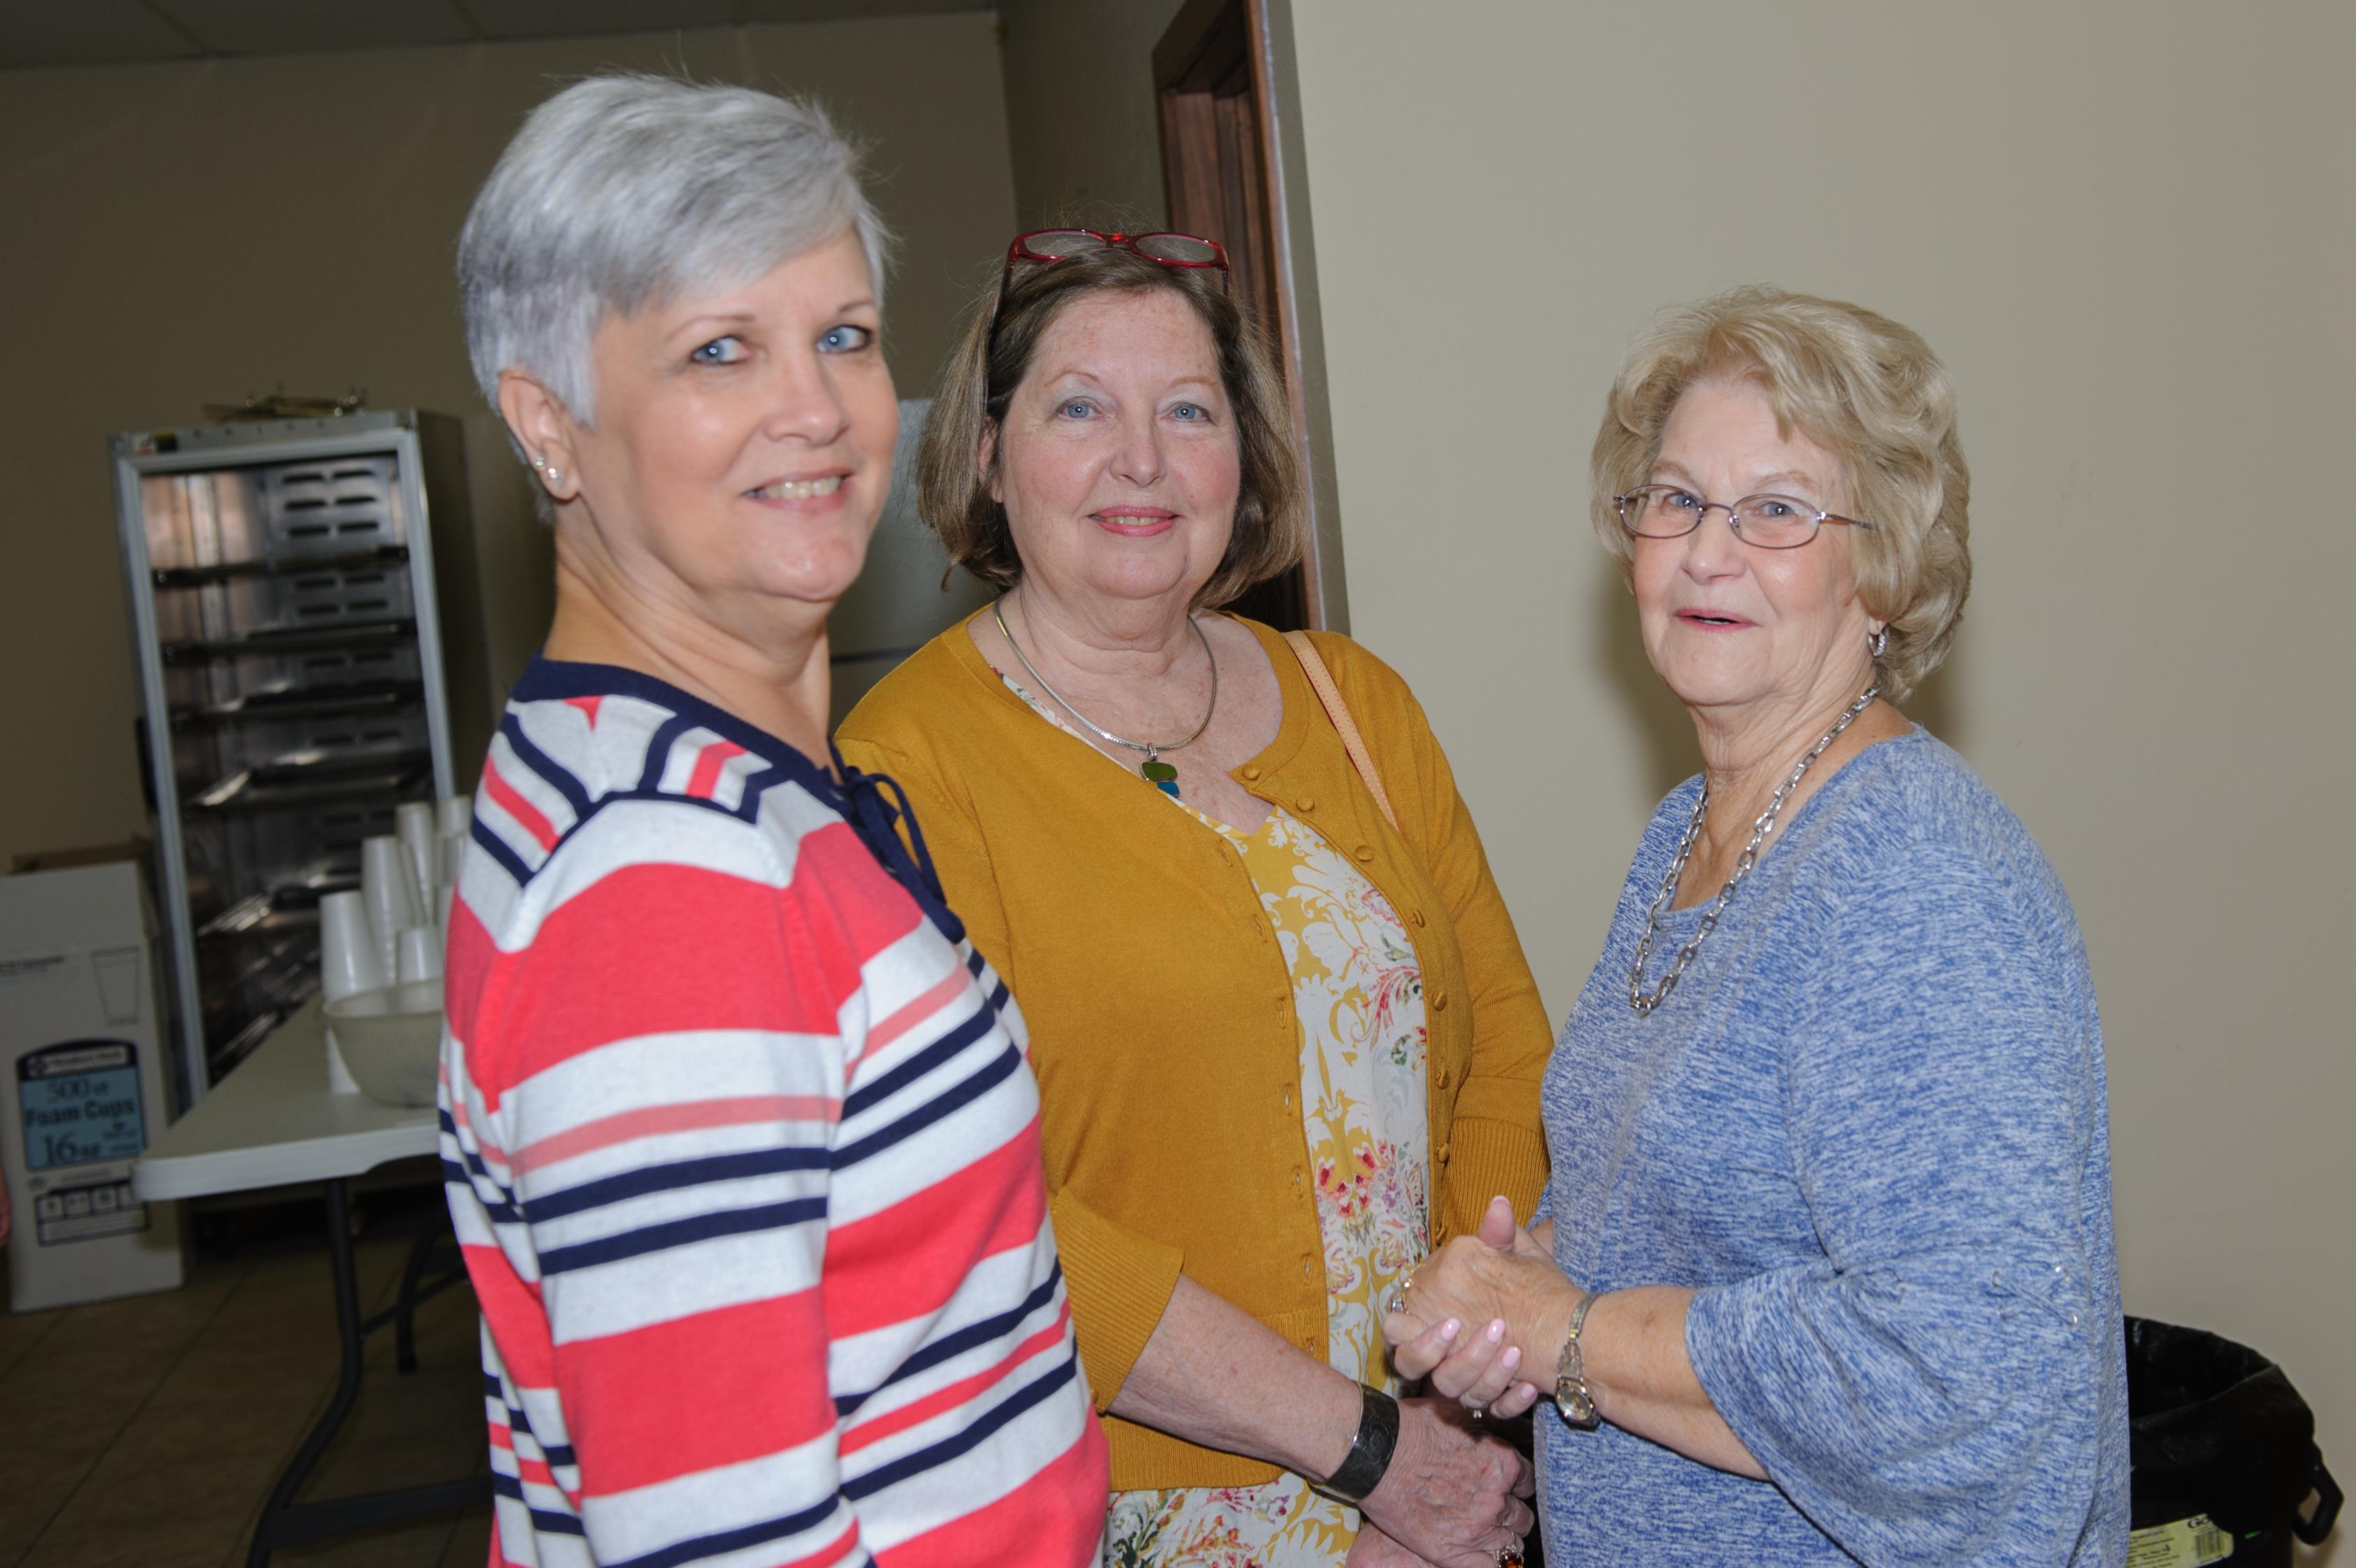 Sharon, Judy and Kathy